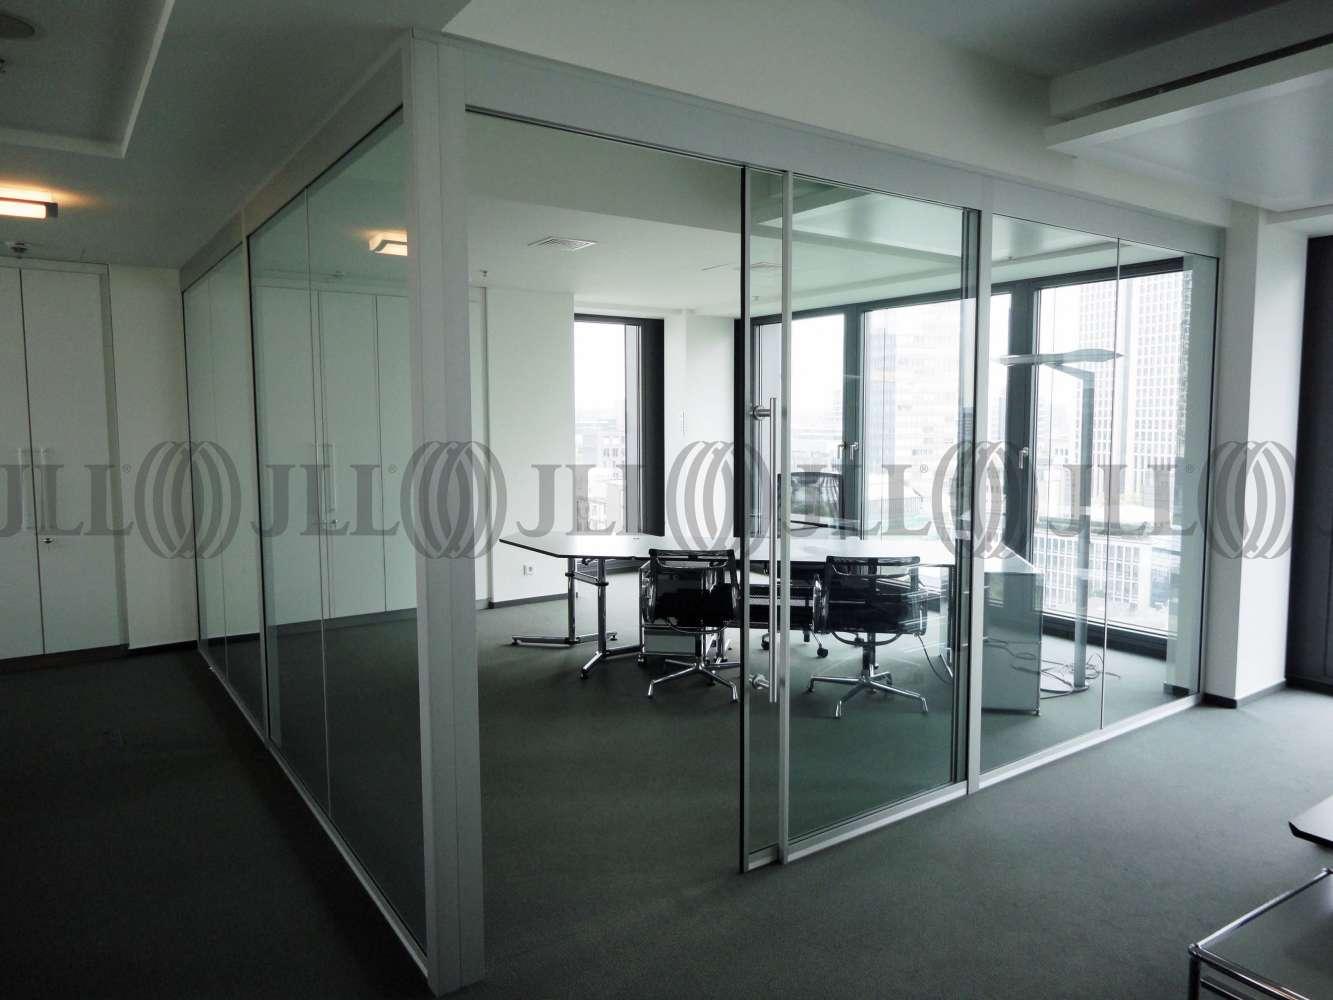 Büros Frankfurt am main, 60325 - Büro - Frankfurt am Main, Westend - F1068 - 10633324